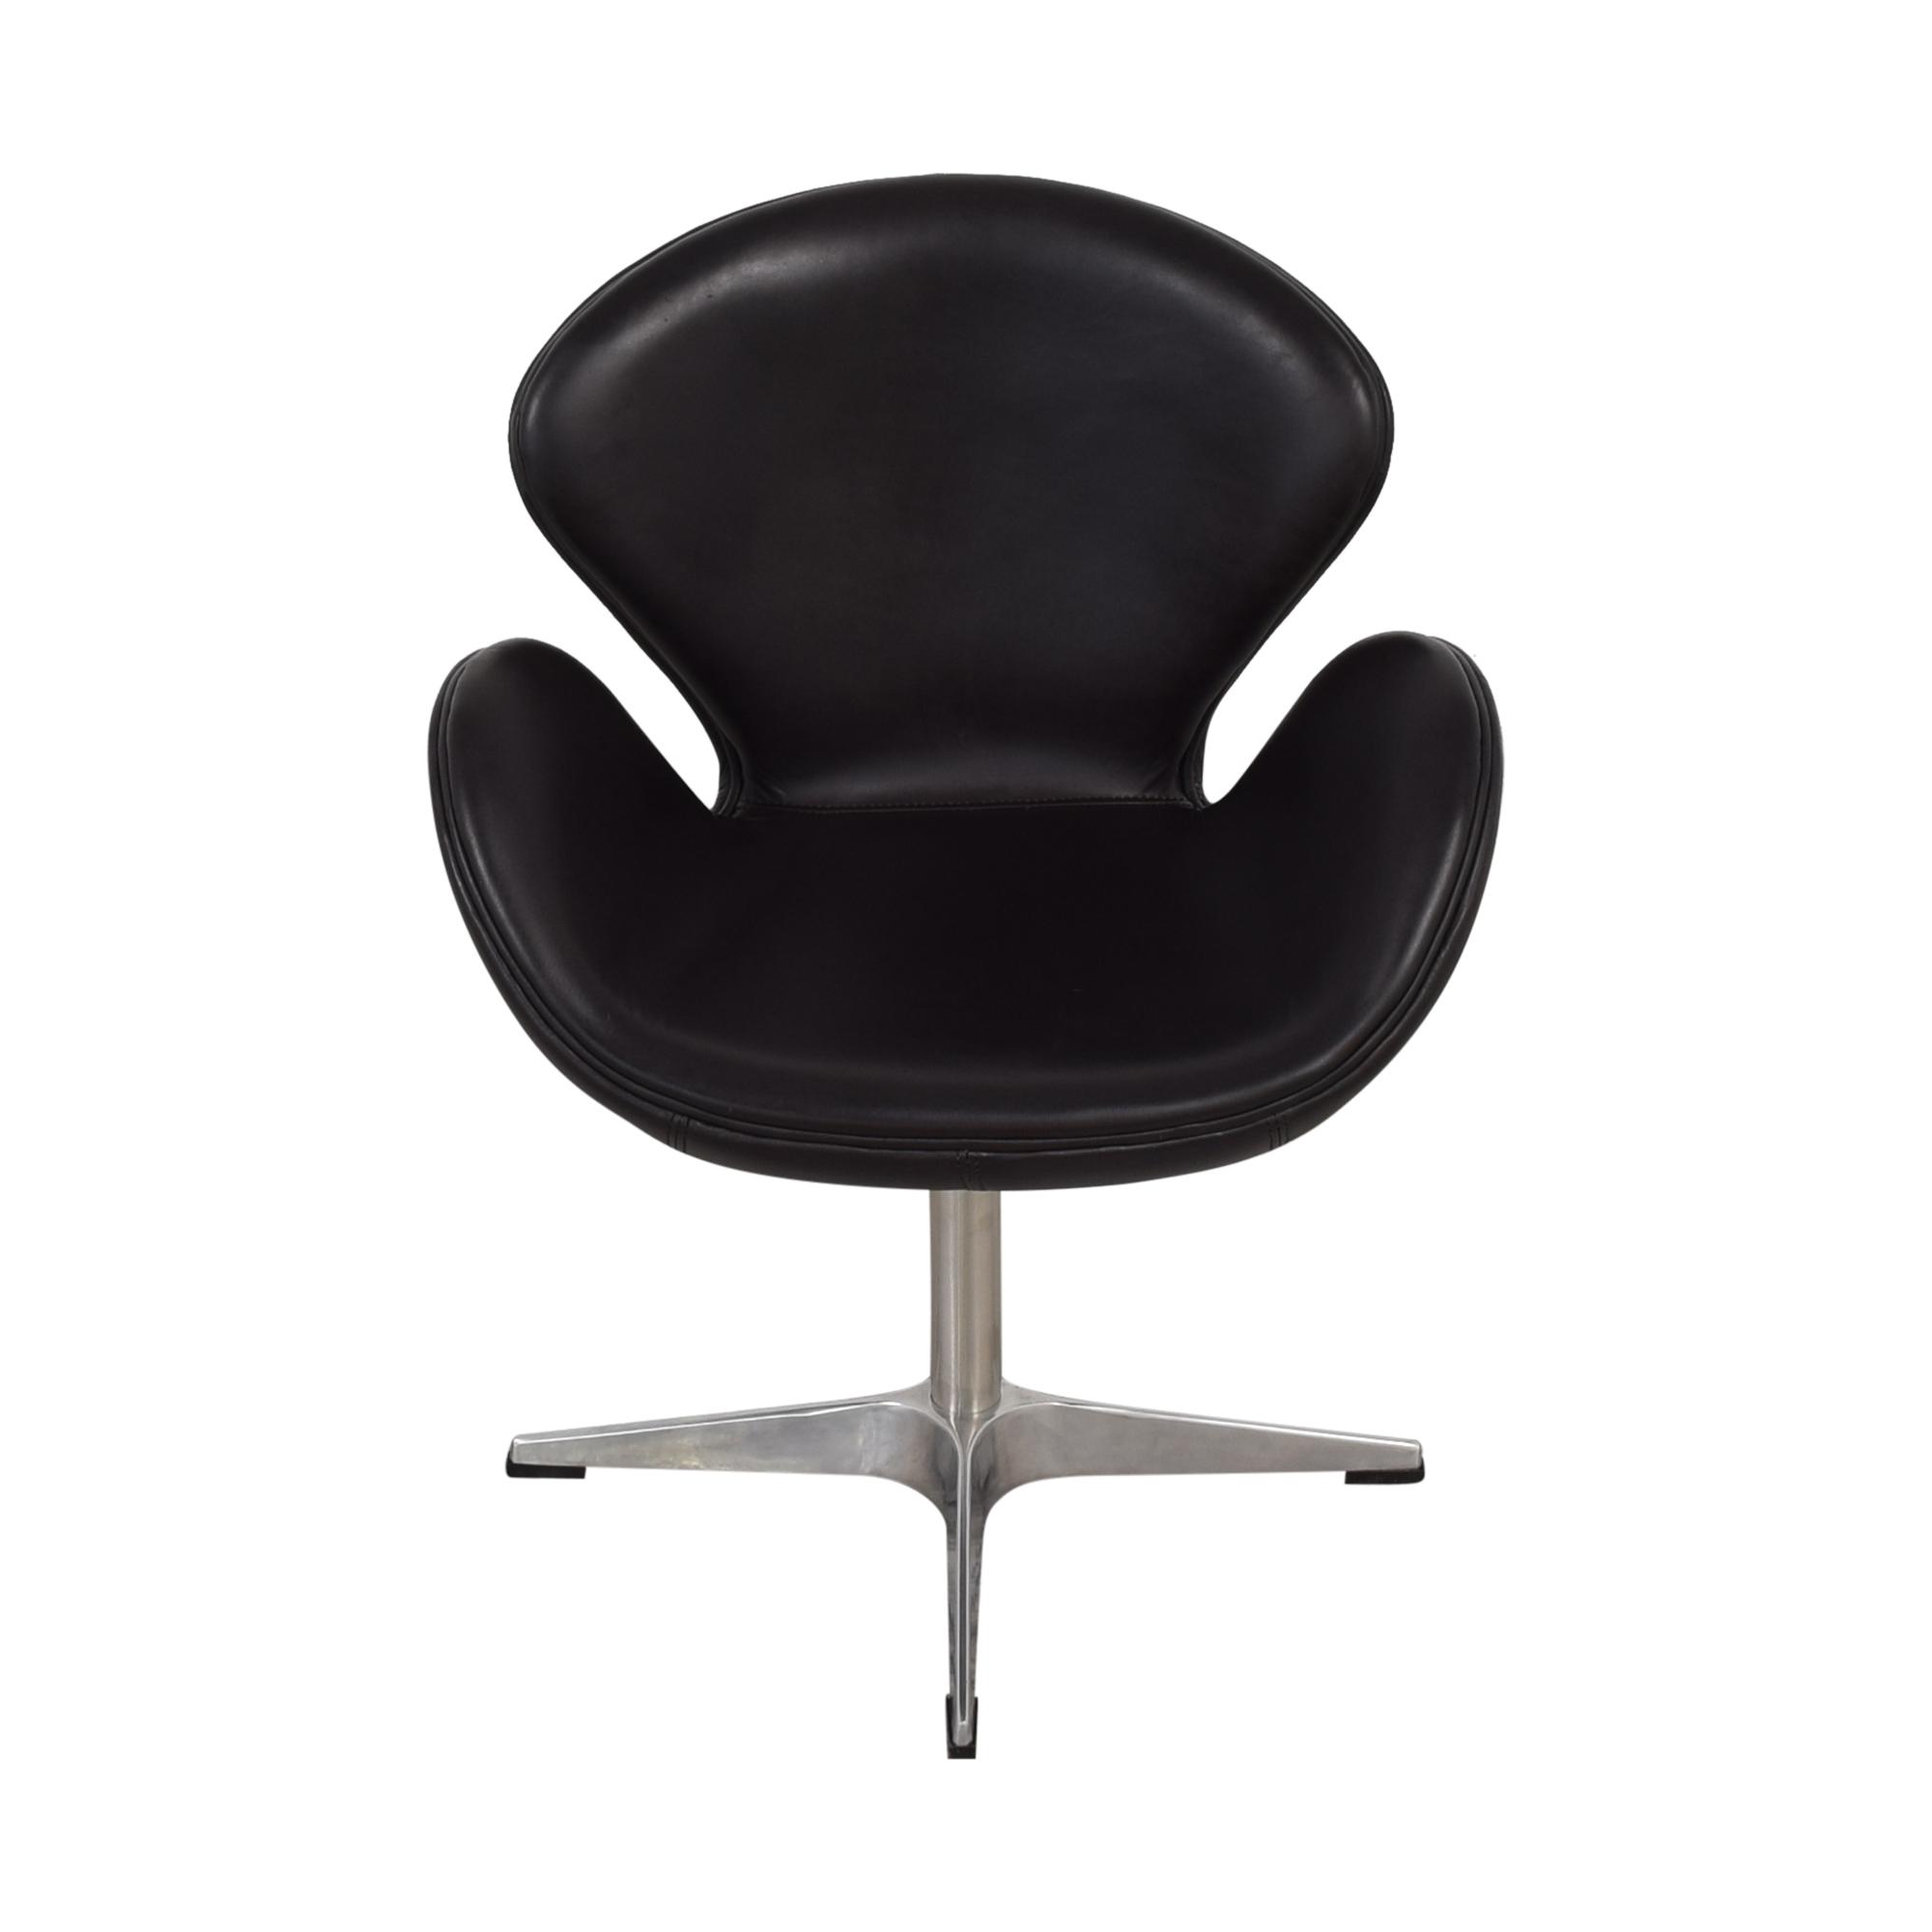 shop ABC Carpet & Home Jacobsen-Style Swan Chair ABC Carpet & Home Chairs